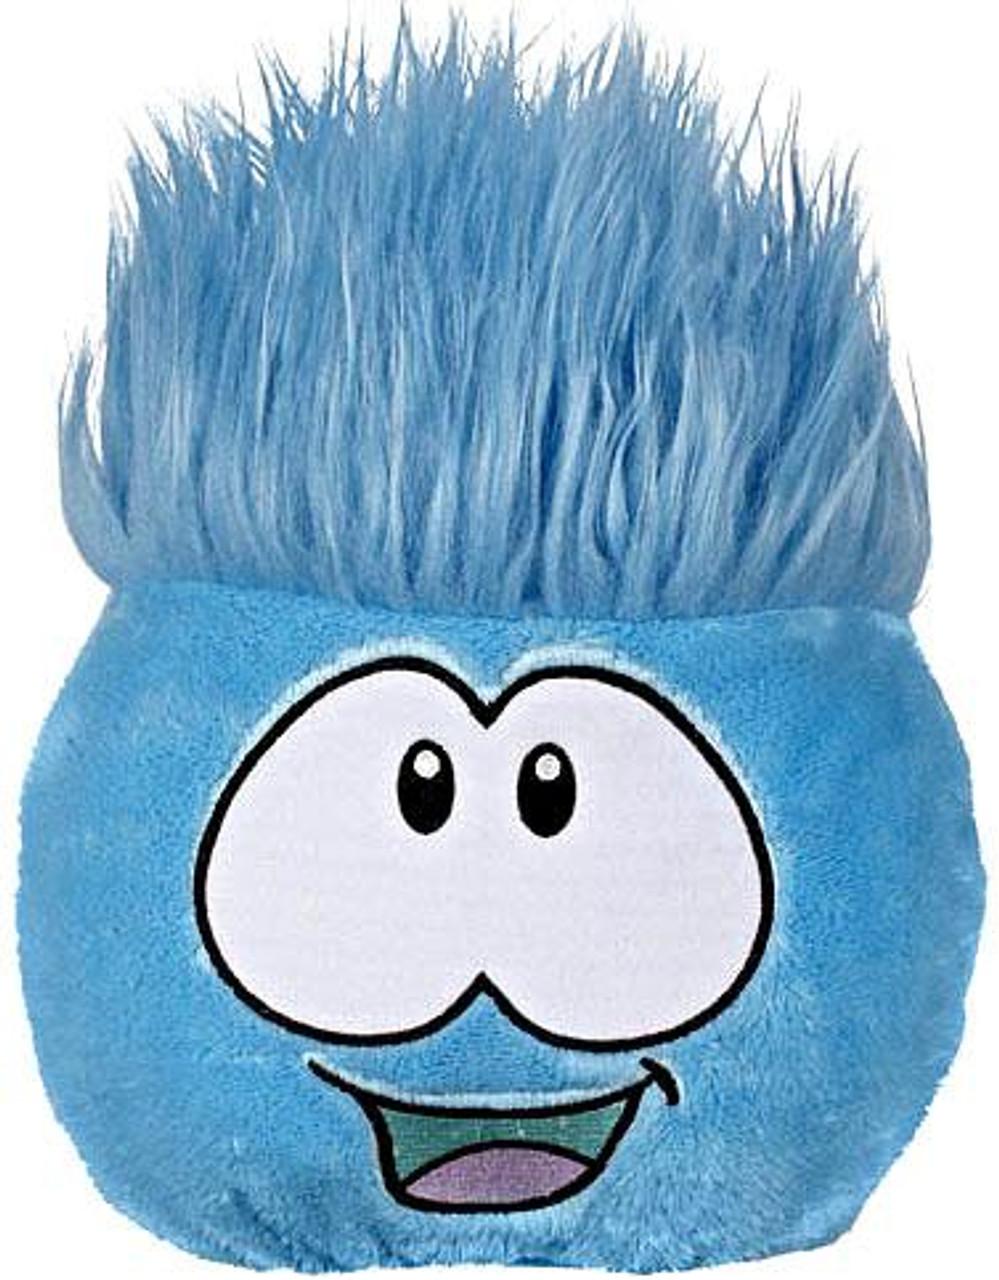 Club Penguin Blue Puffle 8-Inch Plush